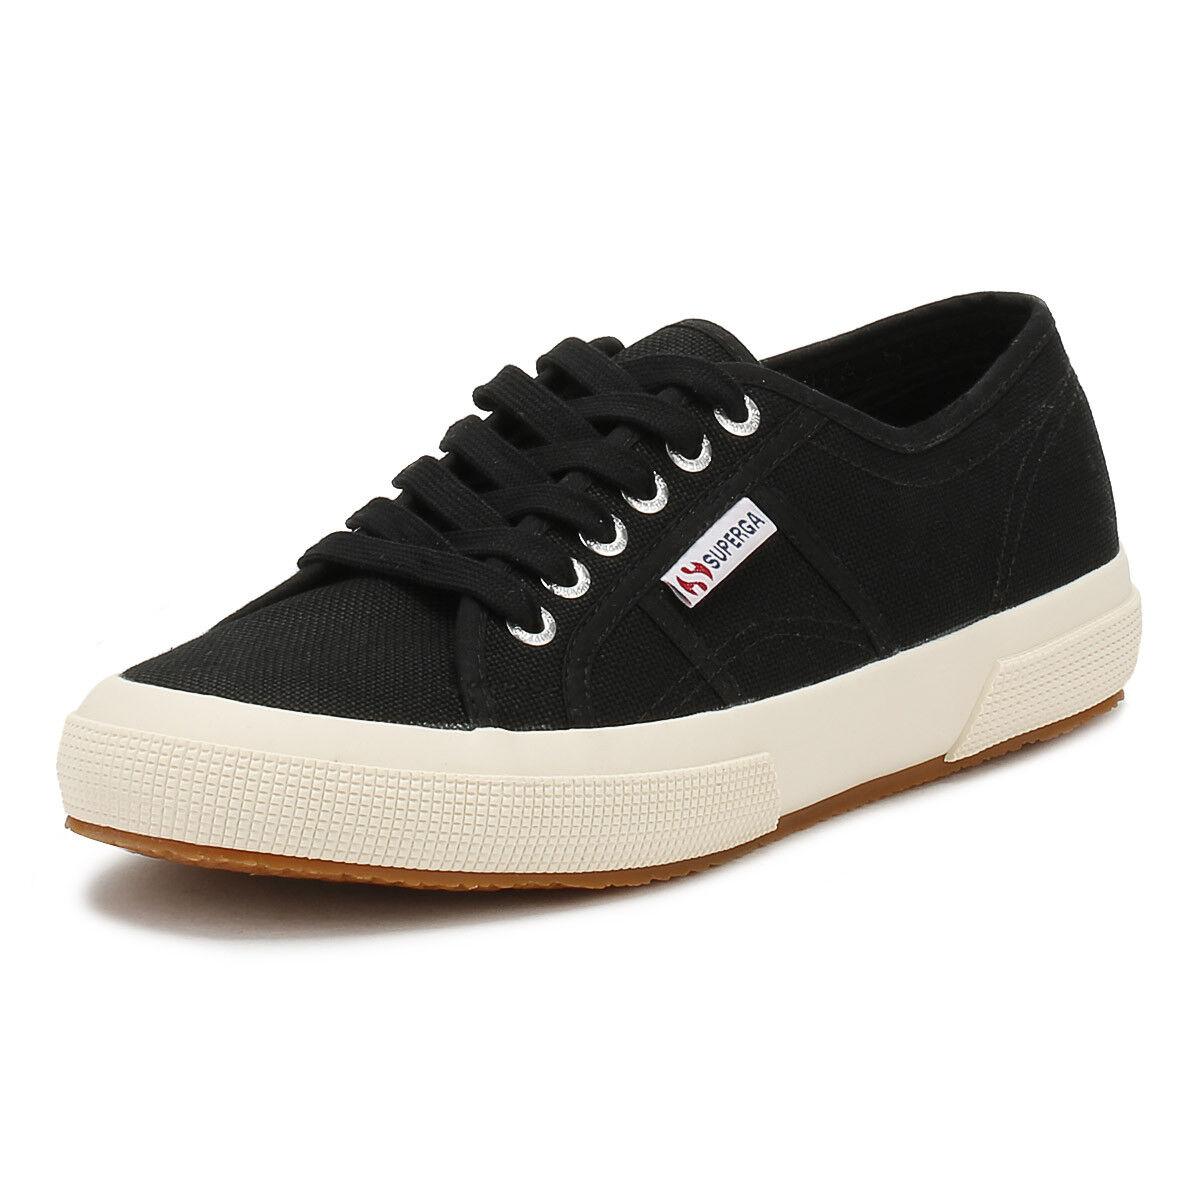 Superga Unisex Trainers Black 2750 Cotu Sport Casual Lace Up Mens Womens Shoes